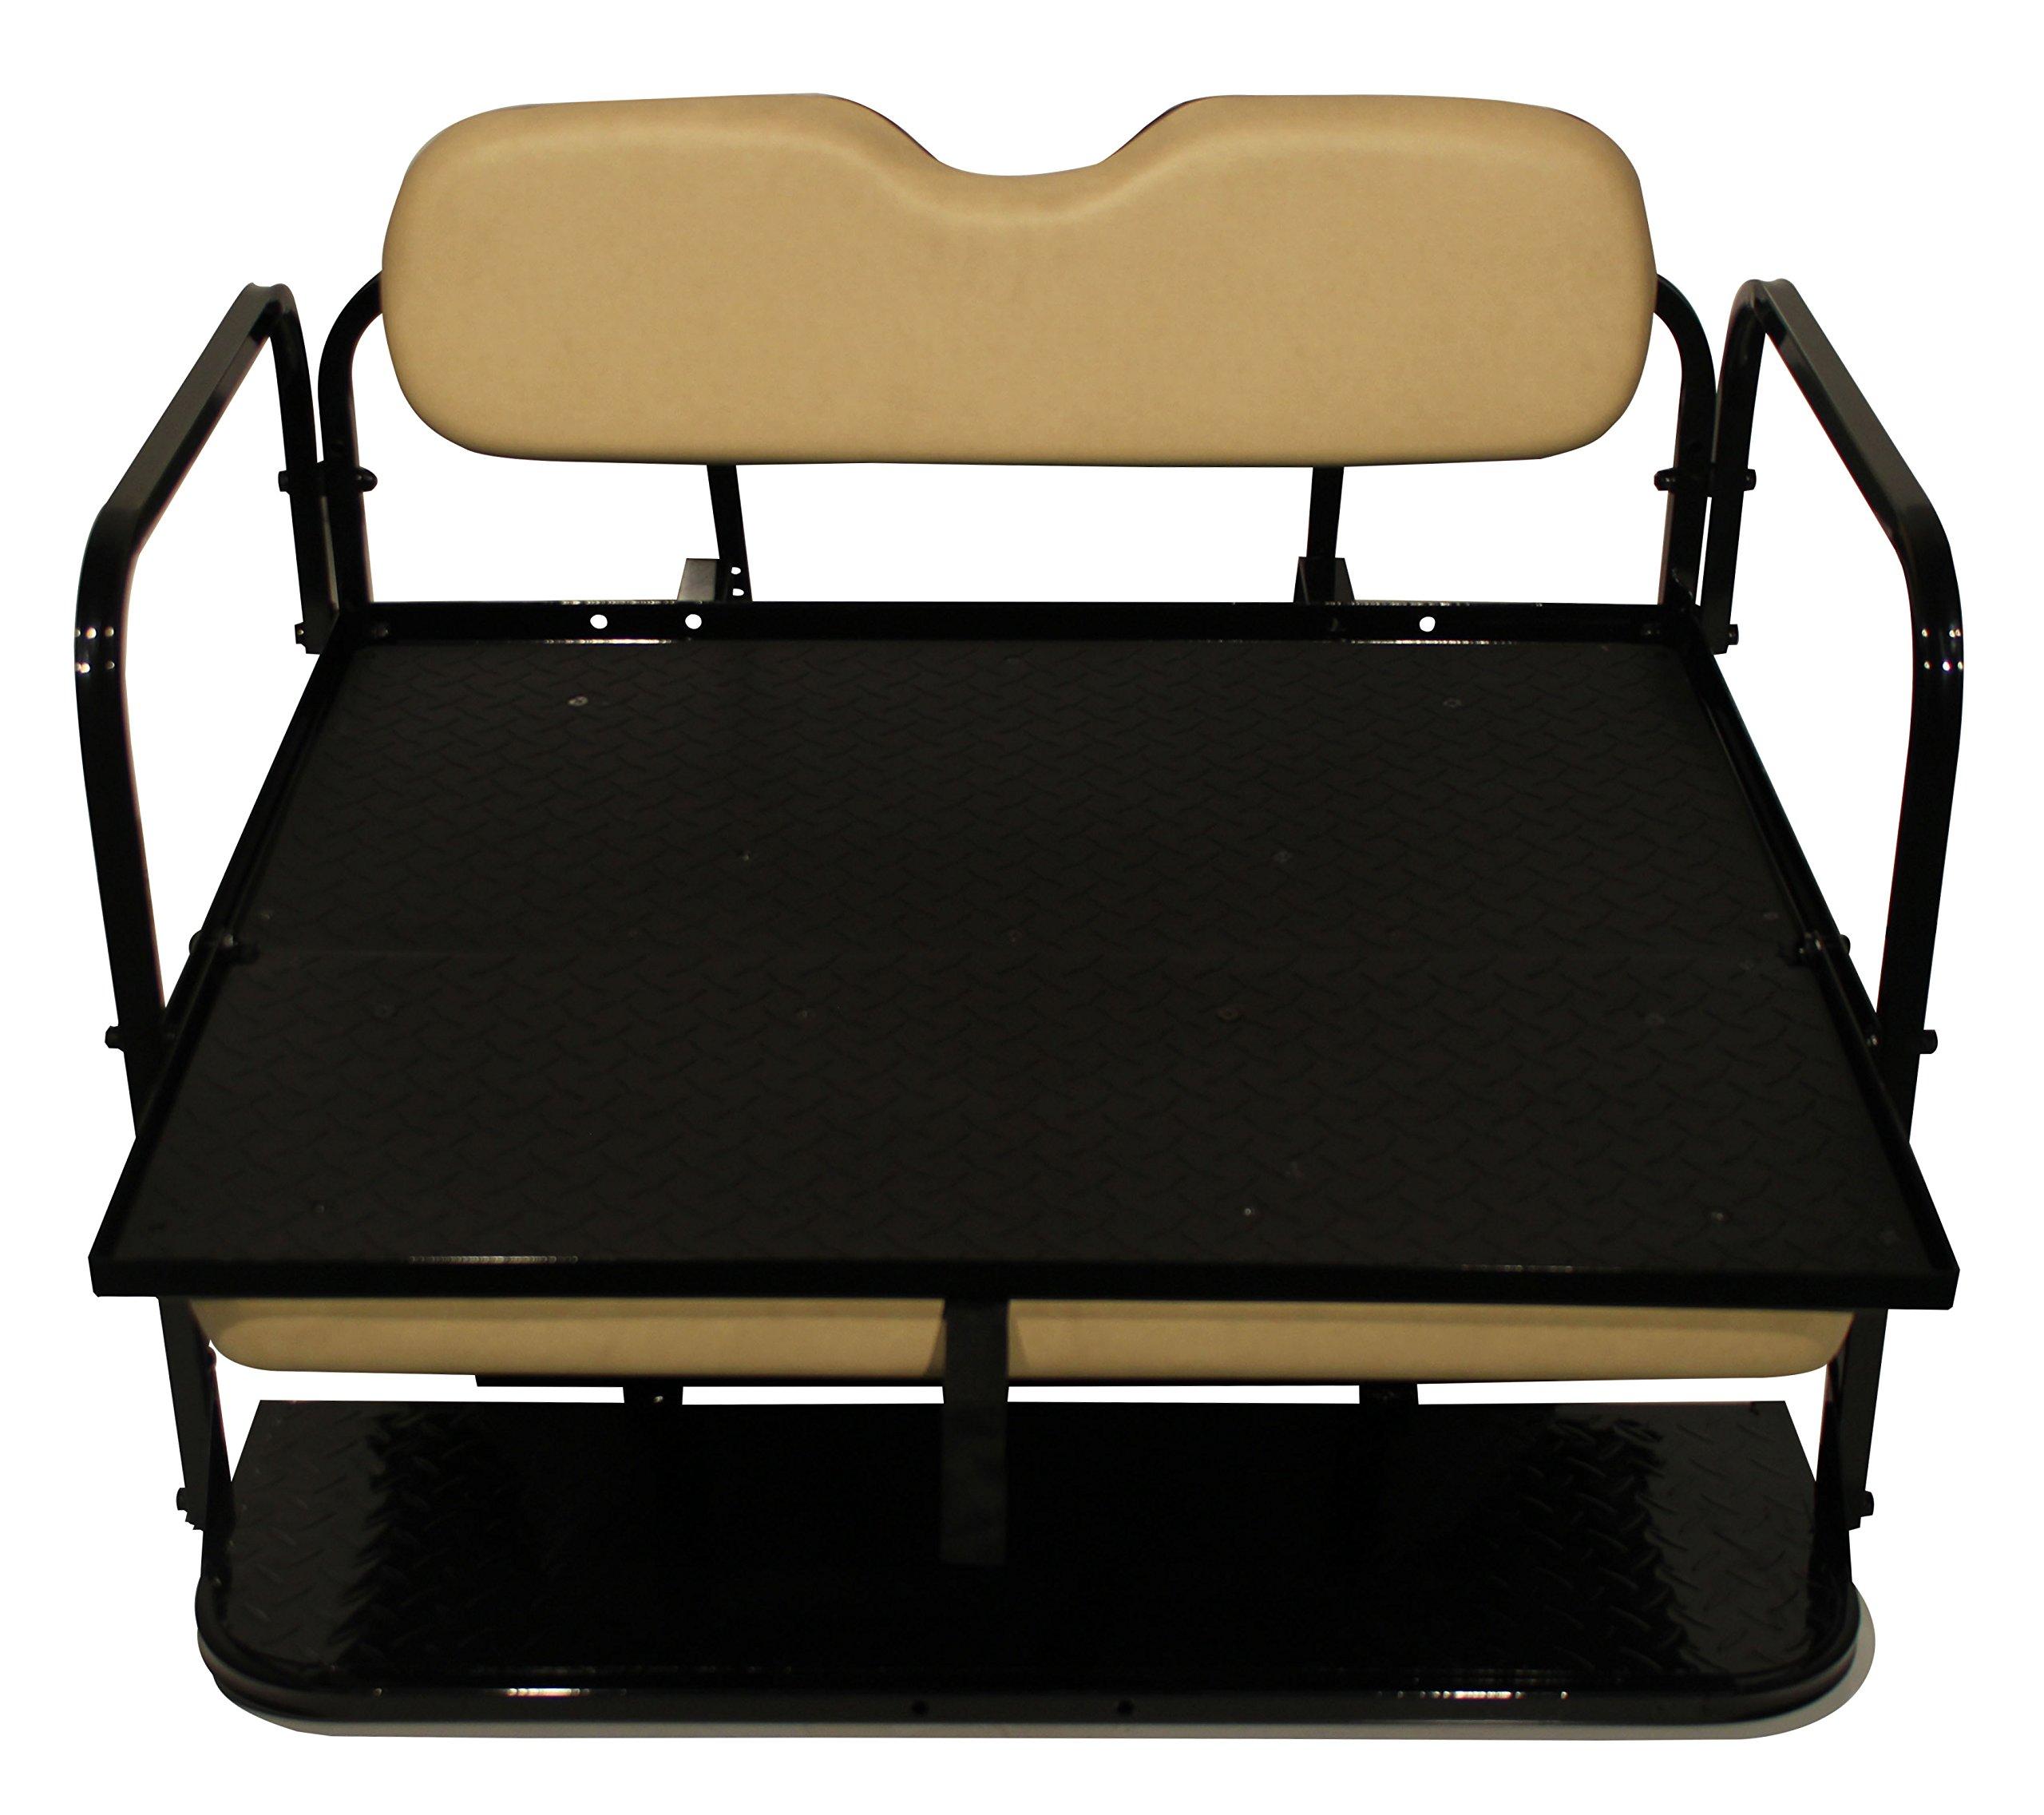 Club Car Precedent Golf Cart Rear Flip Flop Seat Kit - Color: BUFF by Parts Direct (Image #3)